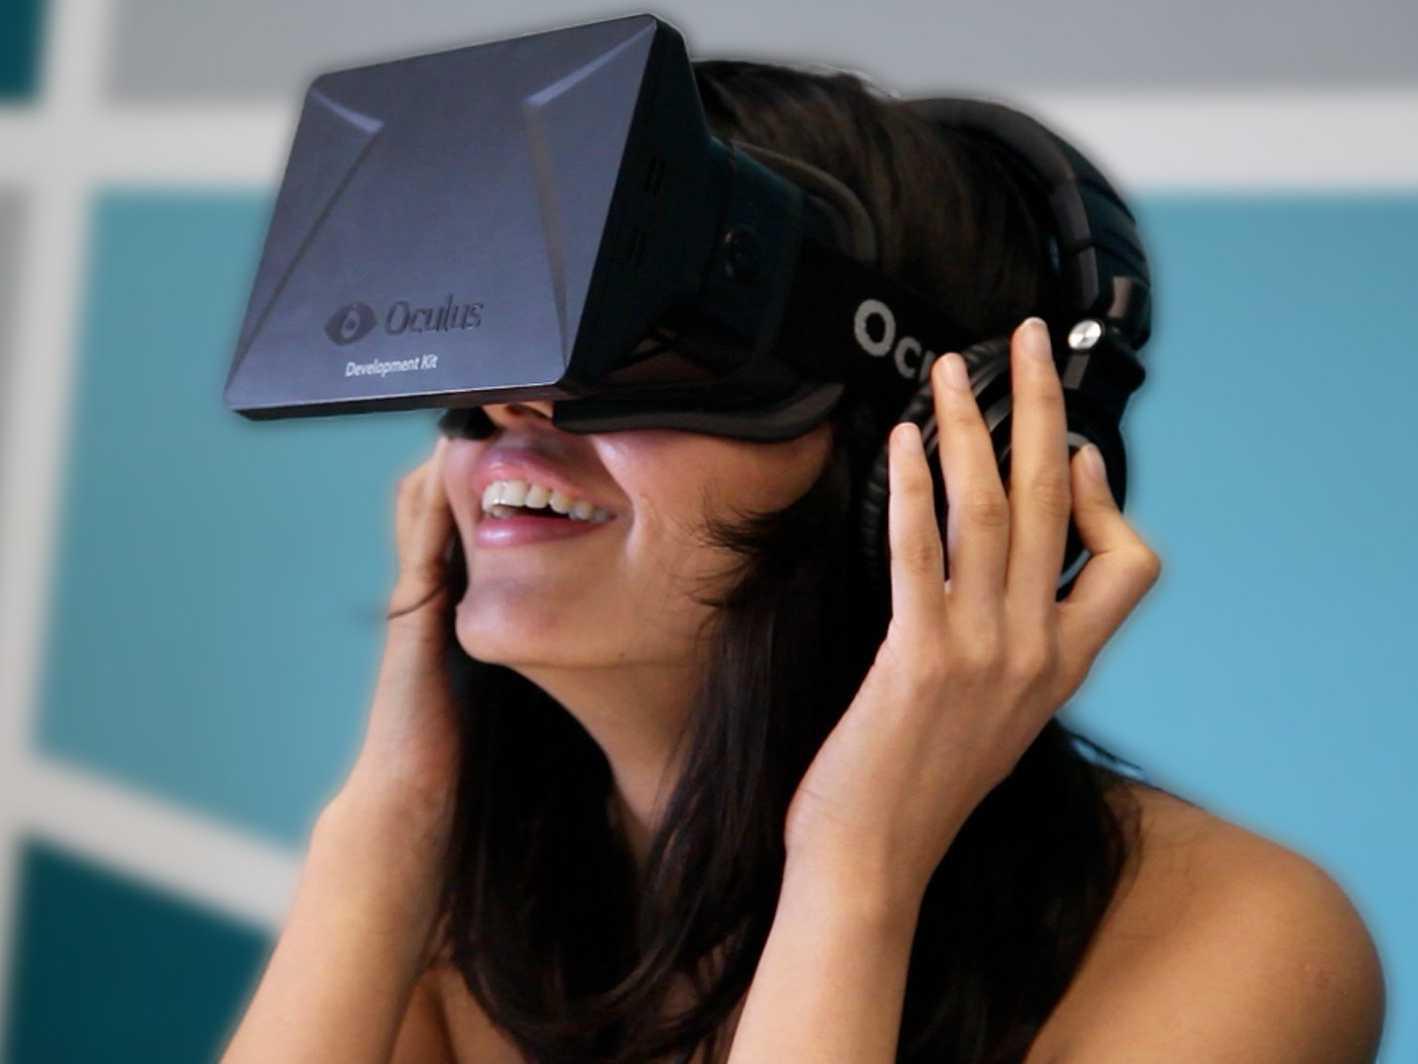 Oculus-Rift-virtual-reality-app-to-you-vt-italia-donna